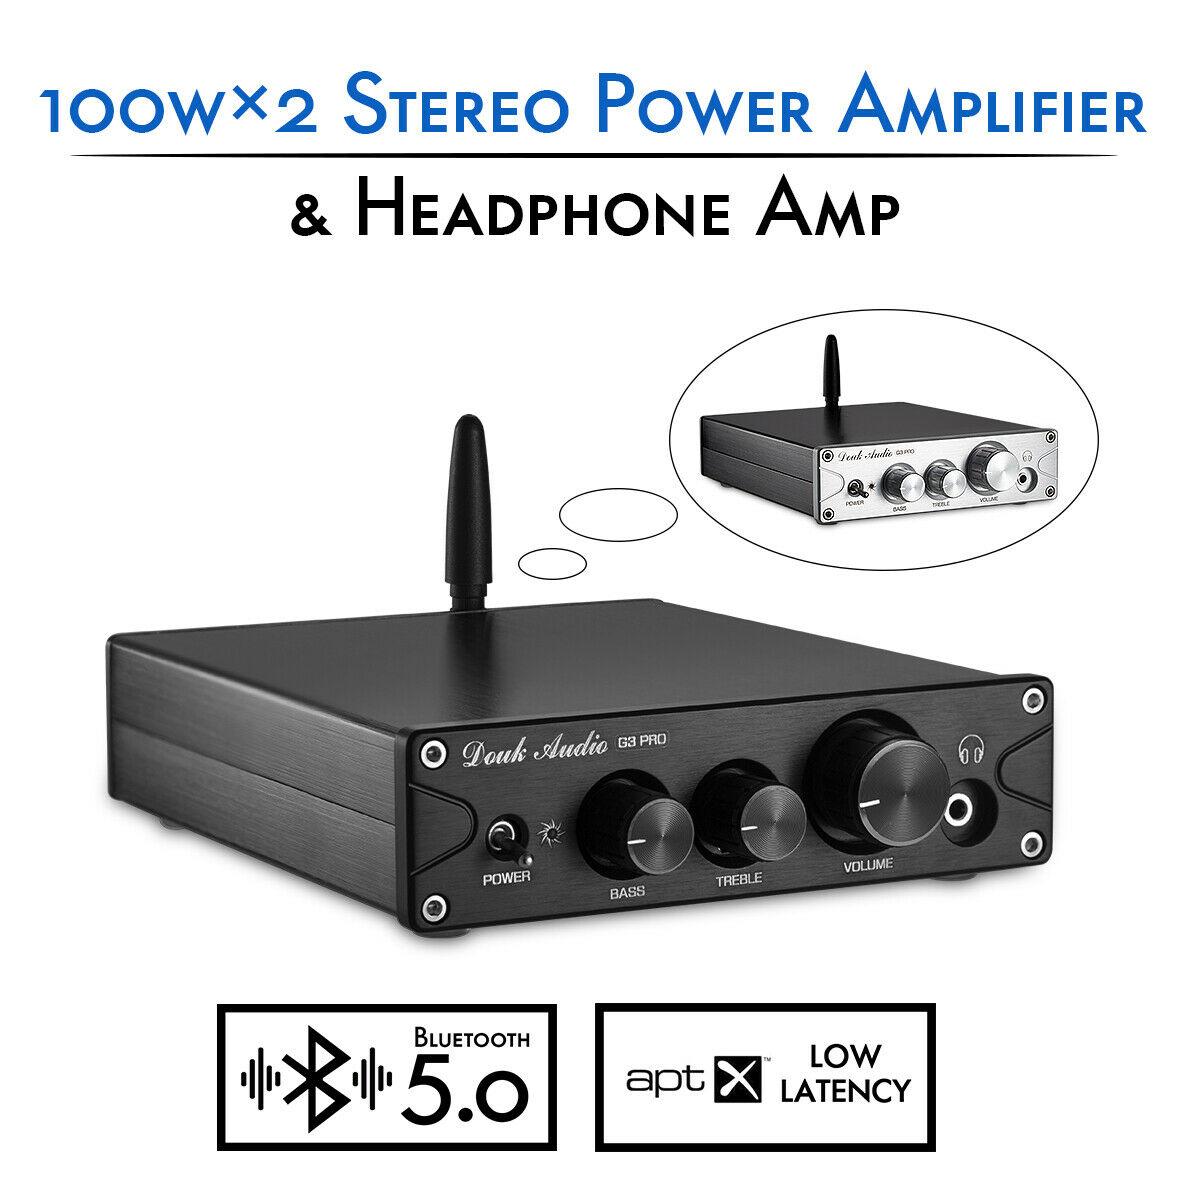 Nobsound HiFi TPA3116 Bluetooth 5.0 APTX ES9018K2M DAC Stereo Class D Power Amplifier Headphone Amp 100W*2Nobsound HiFi TPA3116 Bluetooth 5.0 APTX ES9018K2M DAC Stereo Class D Power Amplifier Headphone Amp 100W*2